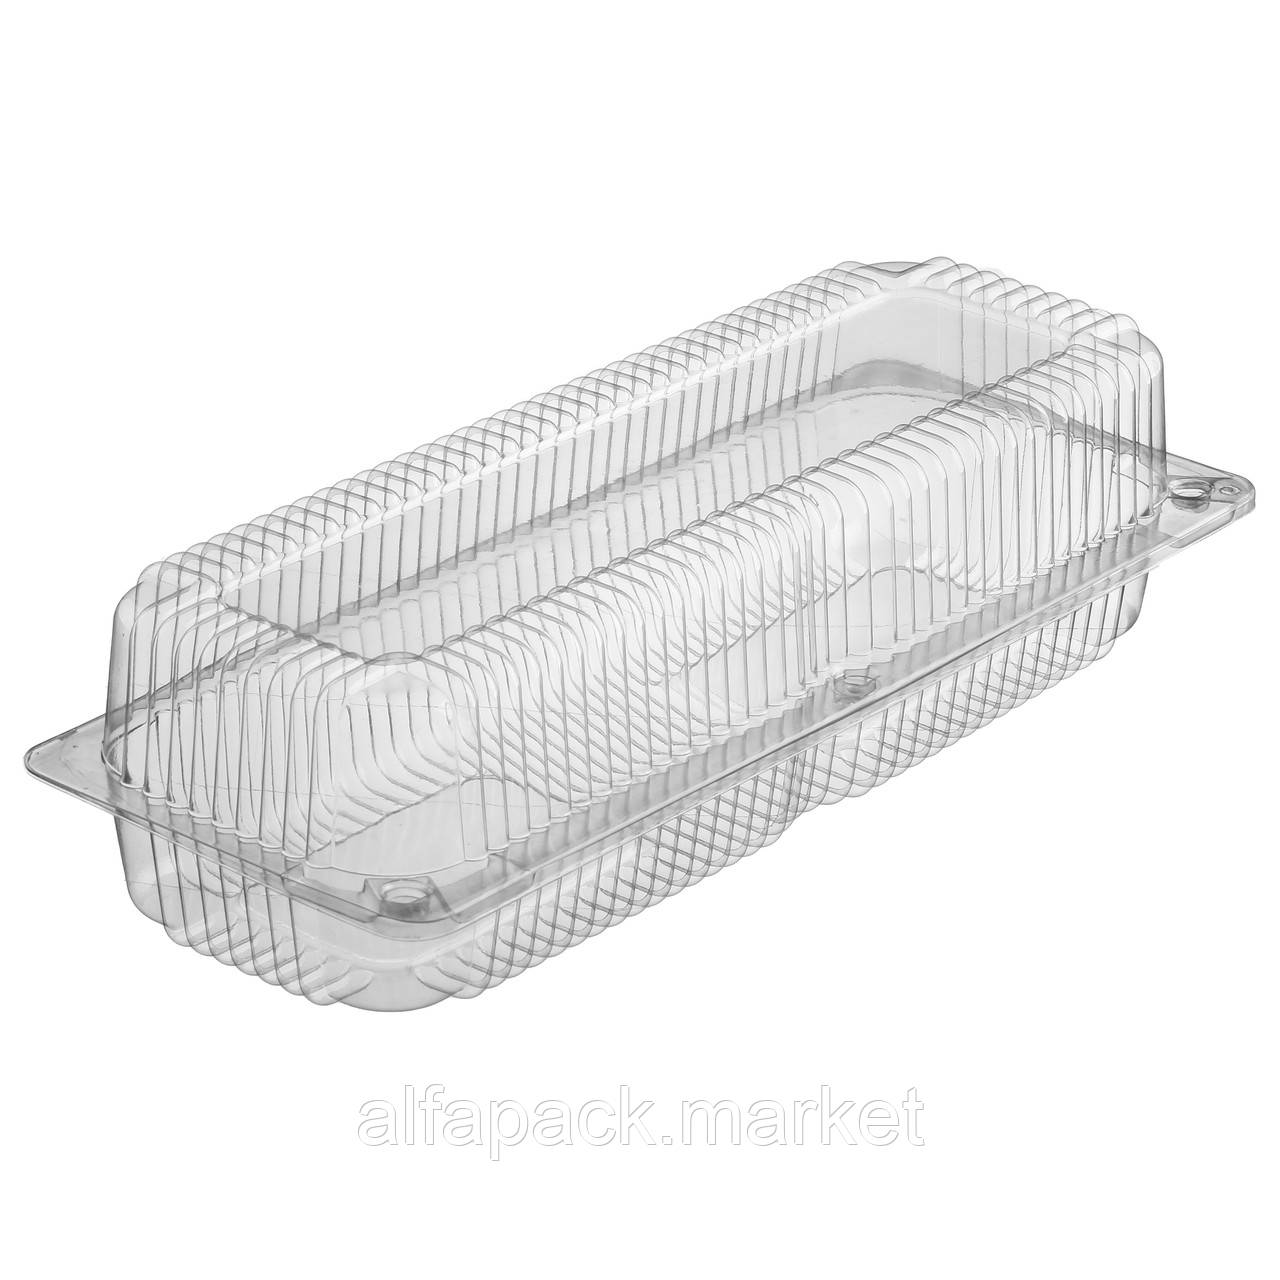 ПС-133 Пластиковий контейнер 323*125*80 (300 шт в ящику) 010100032